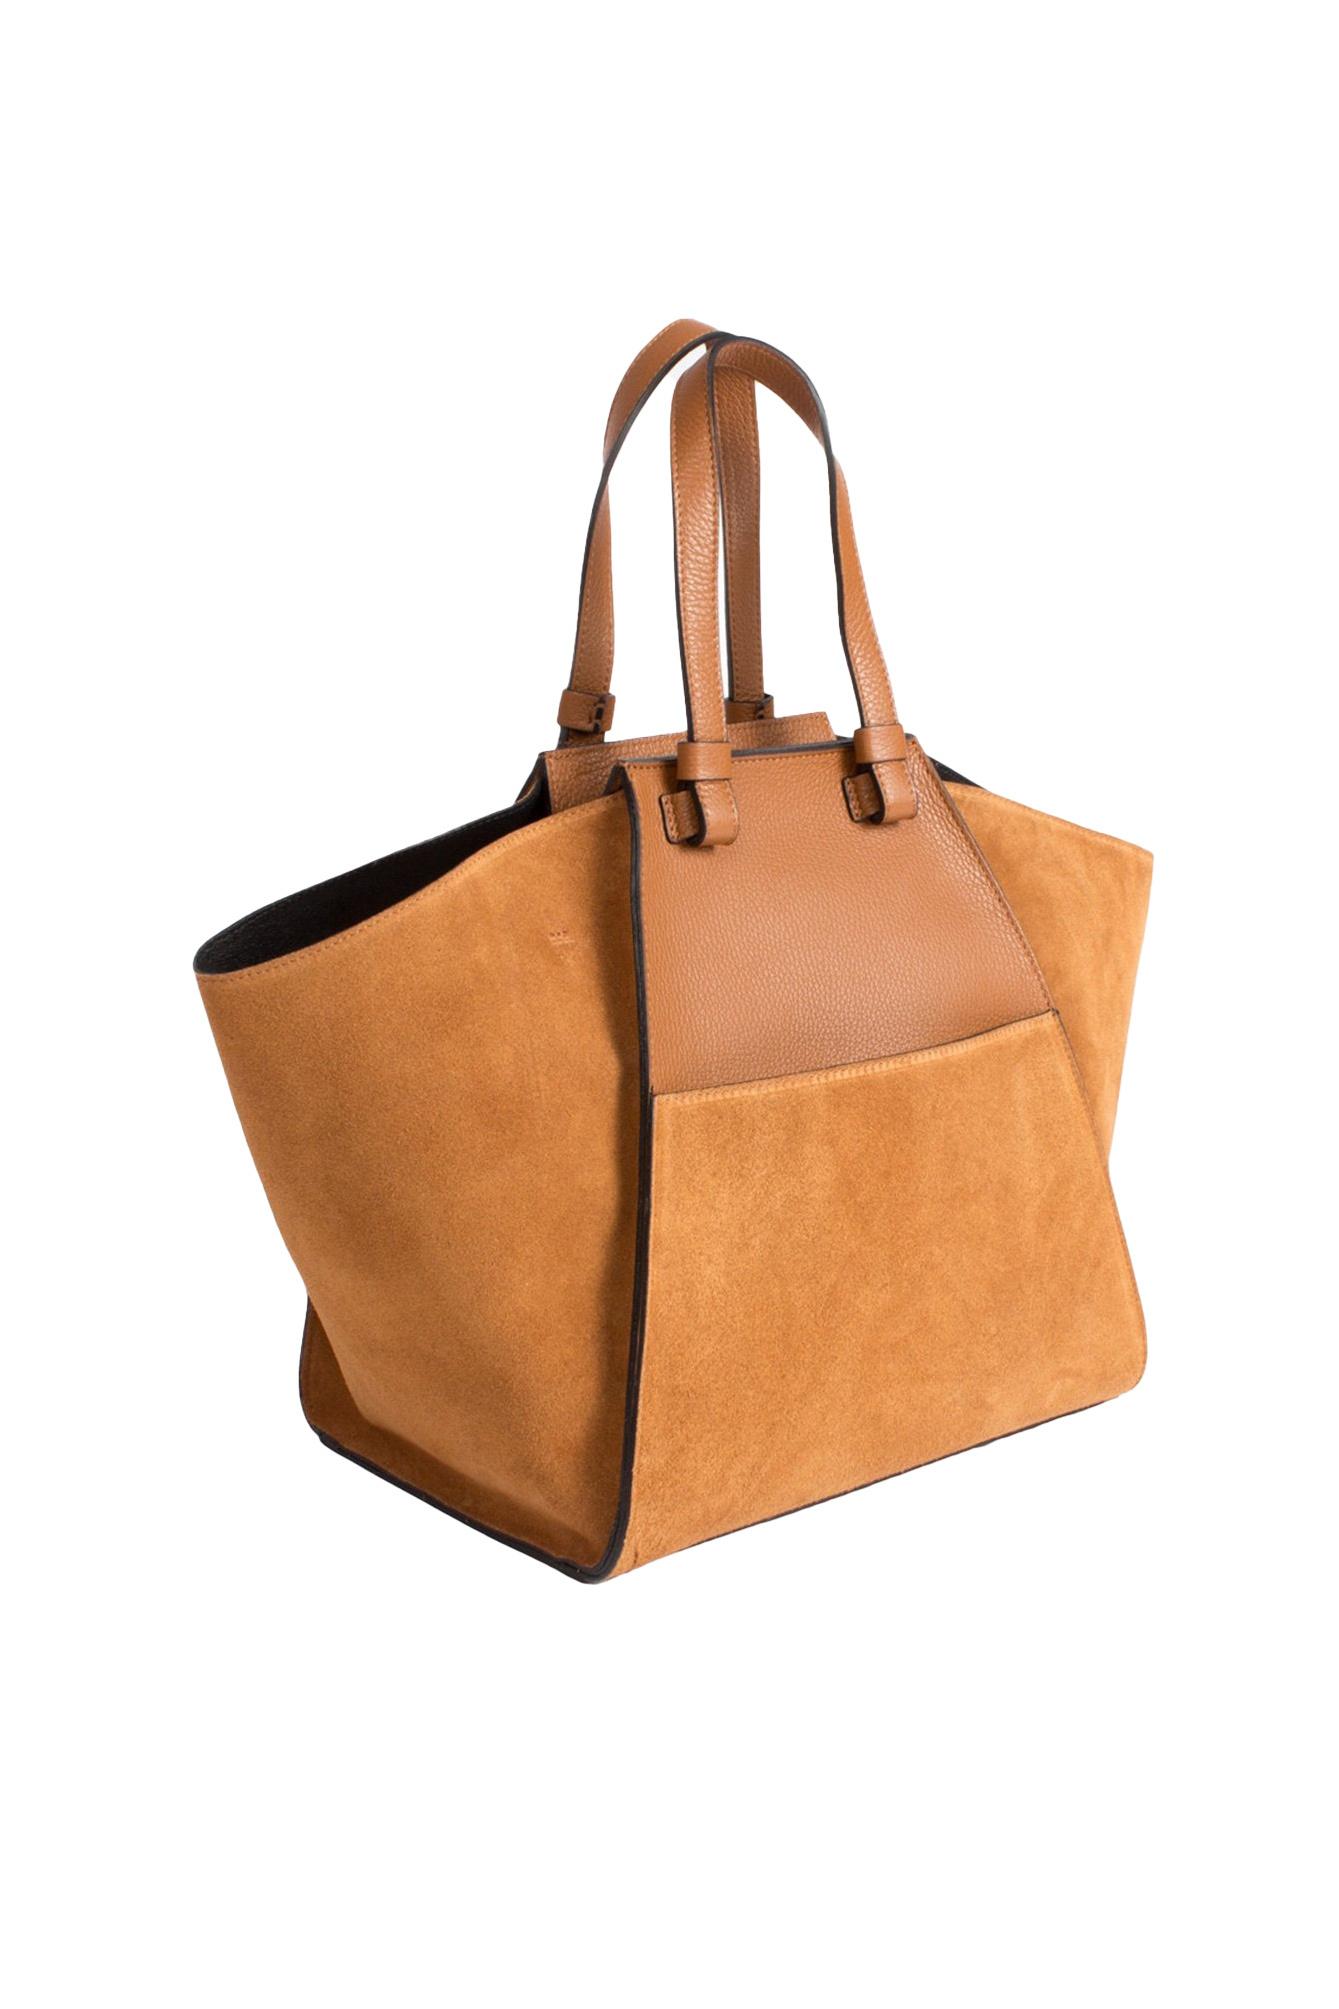 Luxury bag camel